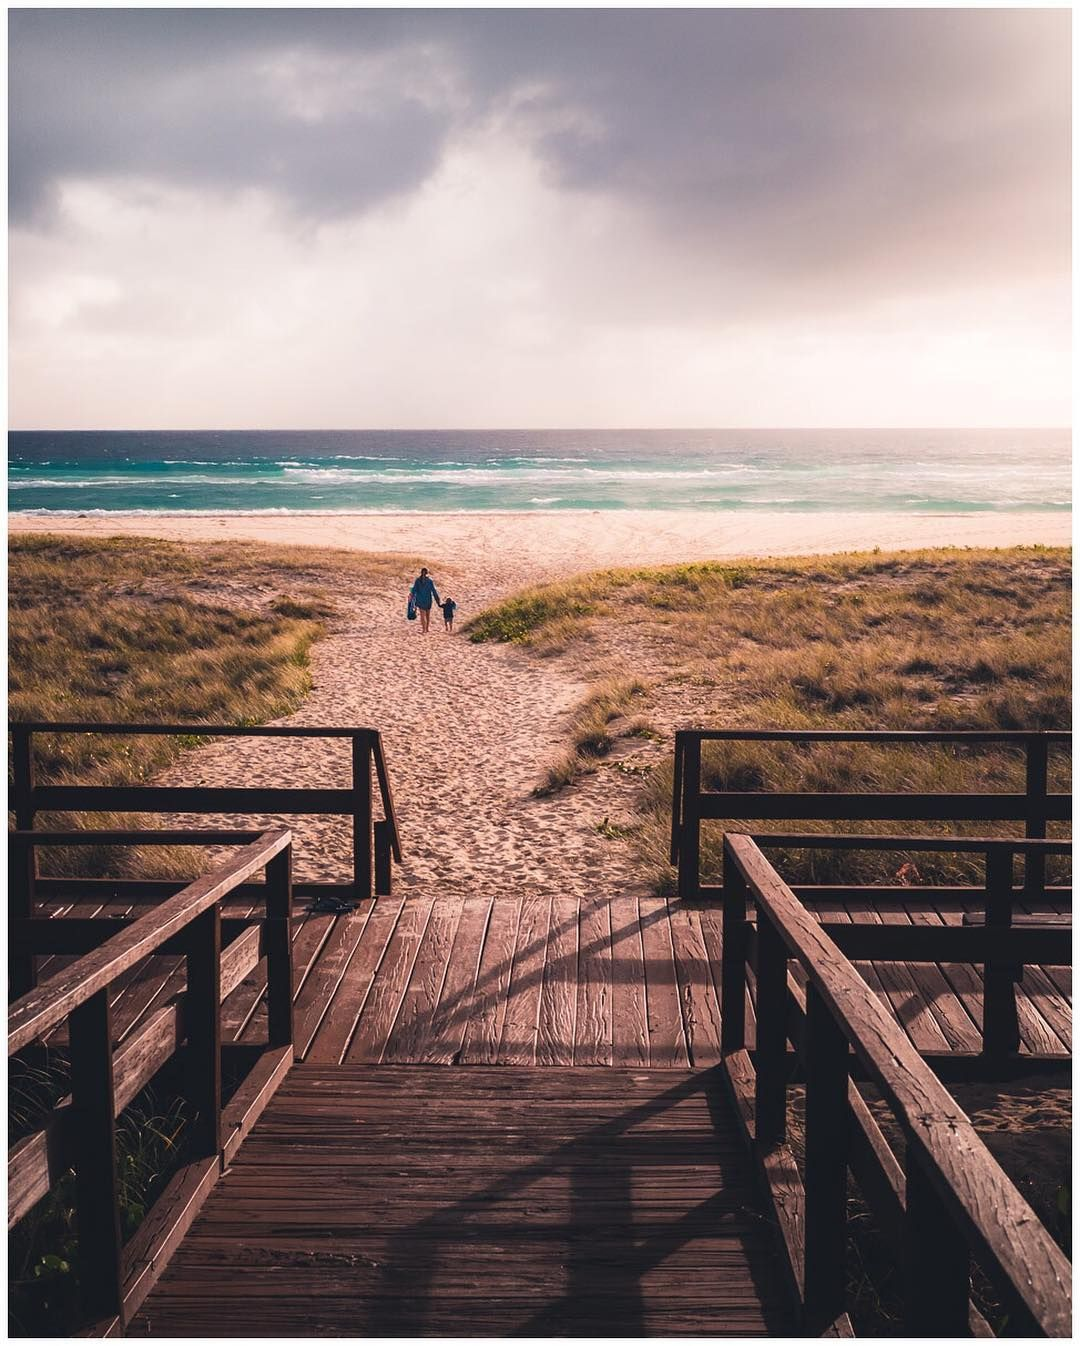 Kirra Beach  July 2018 Fujifilm X-T1  XF35mmF2 1/1400   f8.0   iso800 . . . . . #kirra #beach  Kirra Beach  July 2018  Fujifilm X-T1  XF35mmF2  1/1400   f8.0   iso800 . . . . .  #kirra #beach #sunrise #goldcoast #queensland #seeaustralia #abriefglance #travelphotography #wearegoldcoast #fujifilmxt1 #35mm #xf35mmf2 #_53mm_ #myfujifilm #fujifilmx_au #fujifilmxseries #fujifilmnordic #chasinglight #myfujilove #repostmyfujifilm #fujifilm_global #yvr_streetphoto #lifeawaits #lightroom #yourshotphotogr